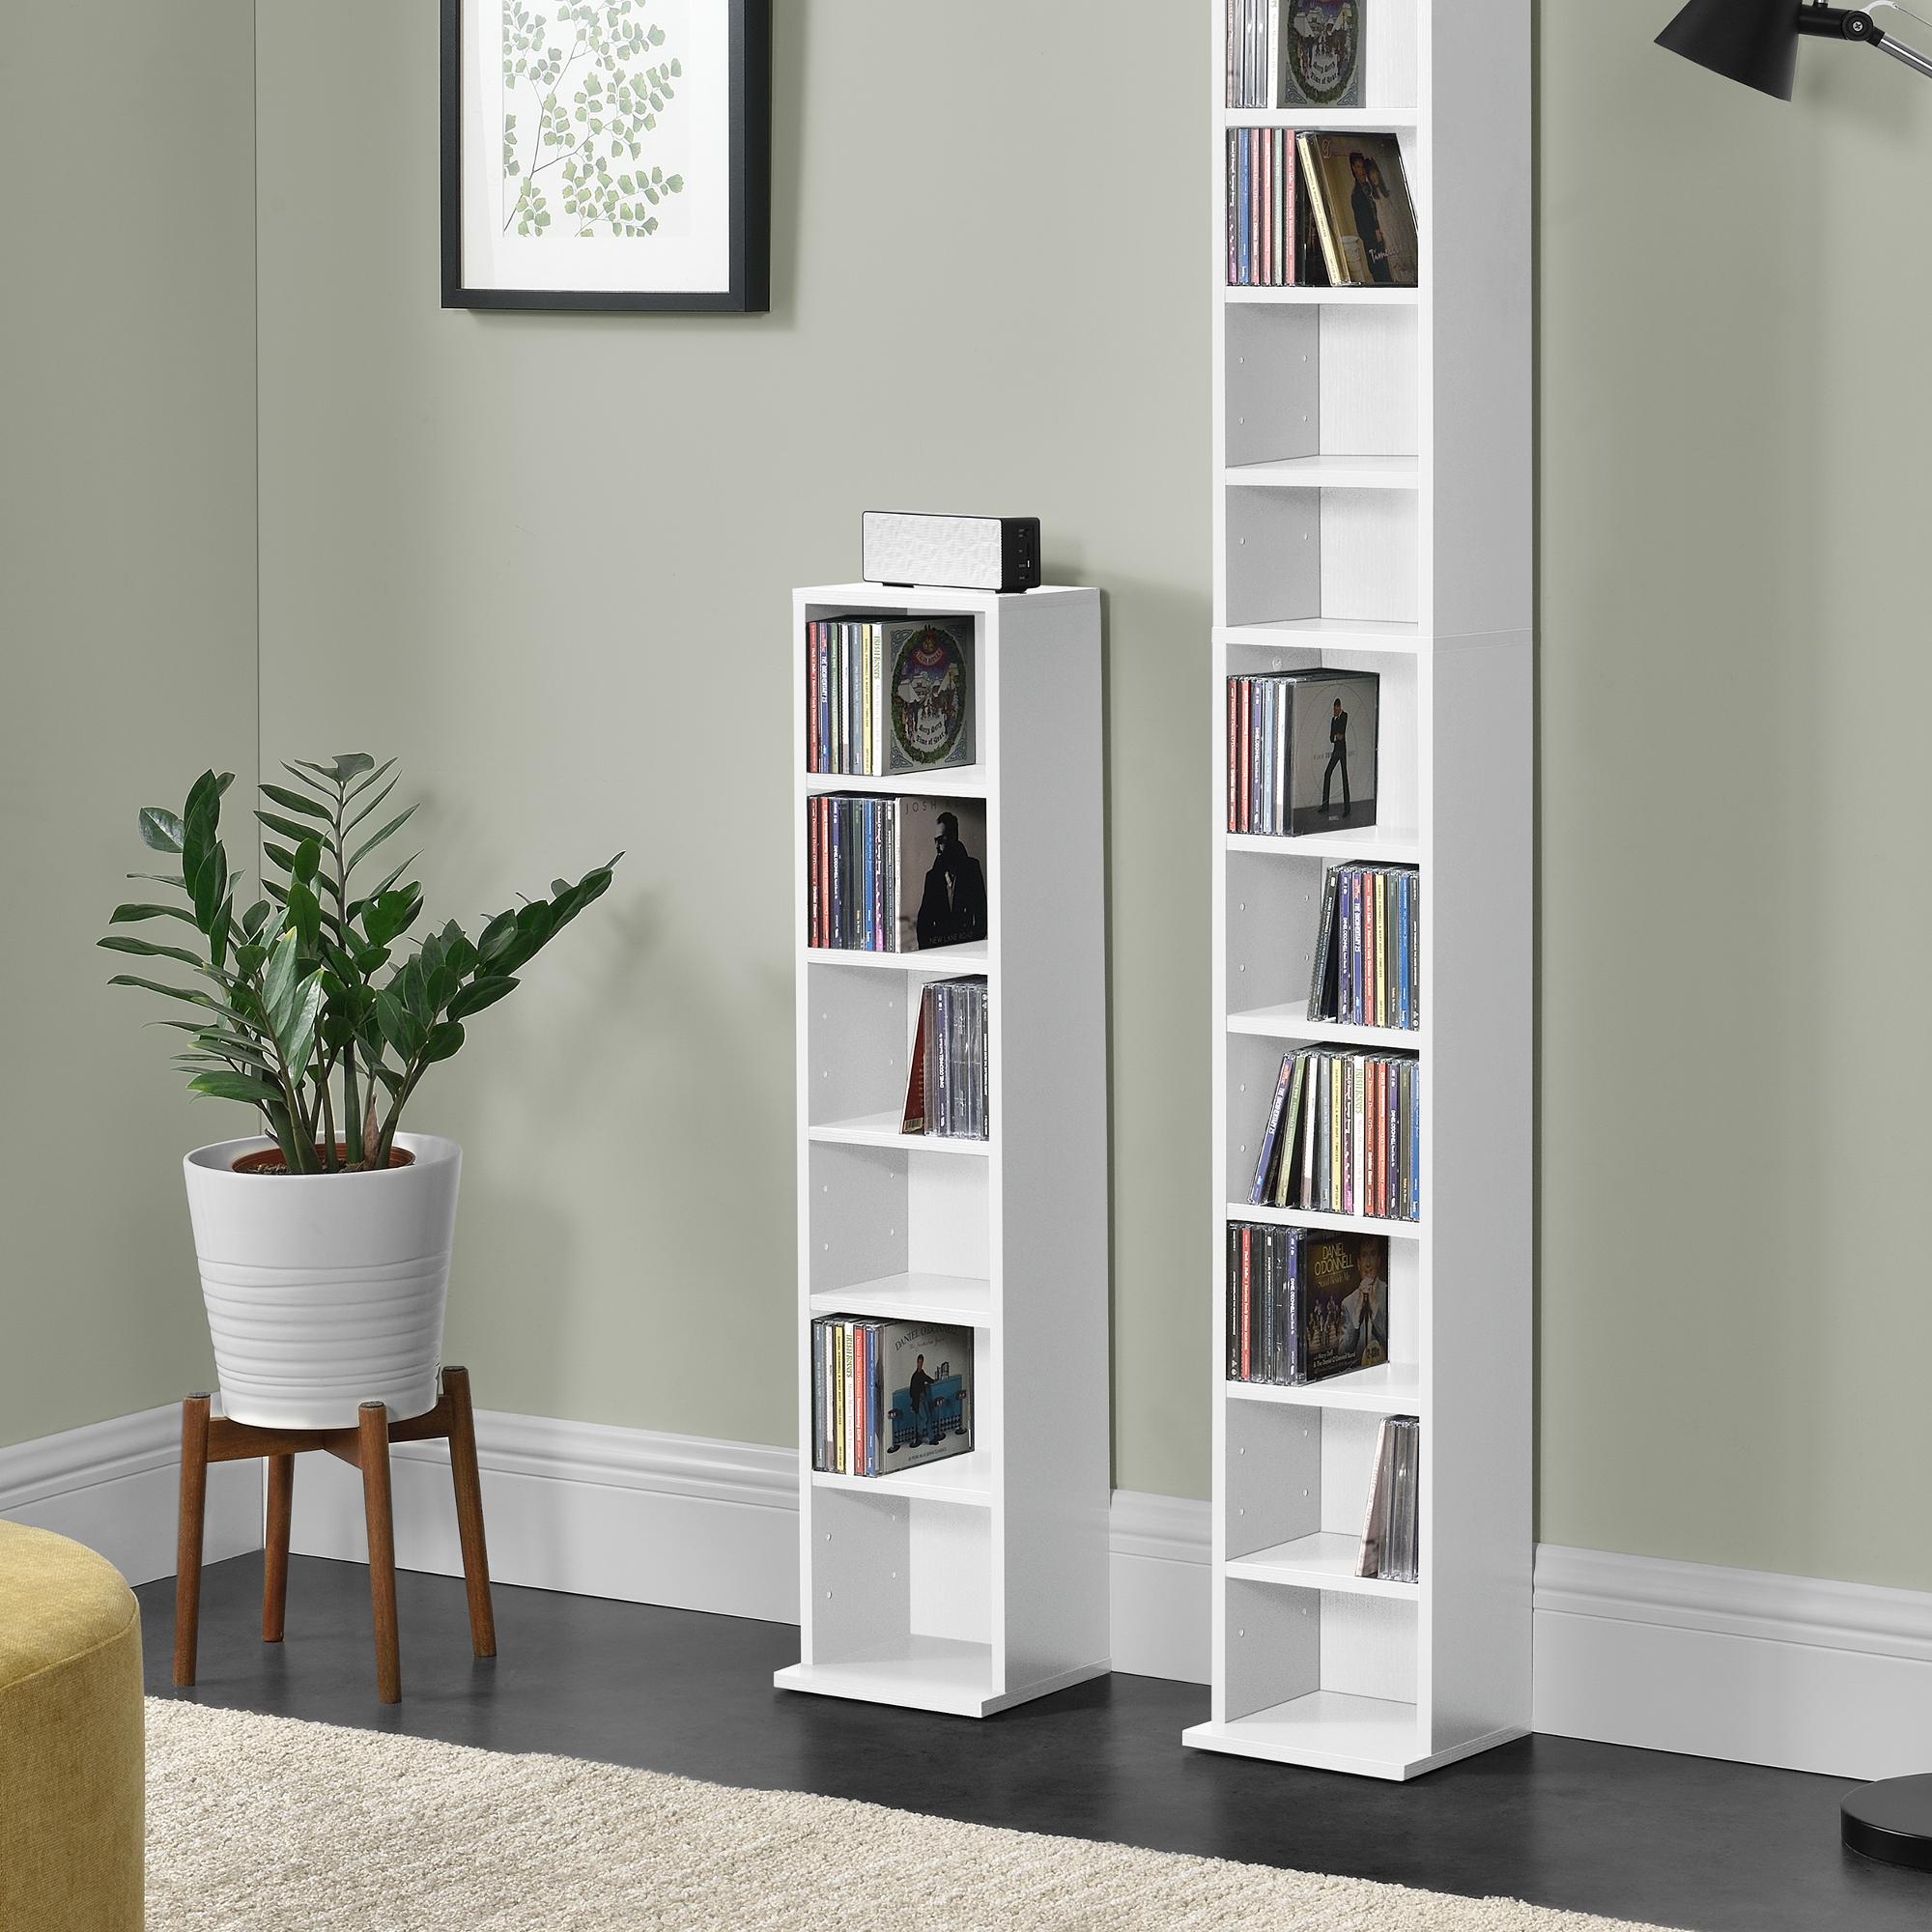 b cherregal cd regal standregal regal aufbewahrung 6 f cher wei ebay. Black Bedroom Furniture Sets. Home Design Ideas